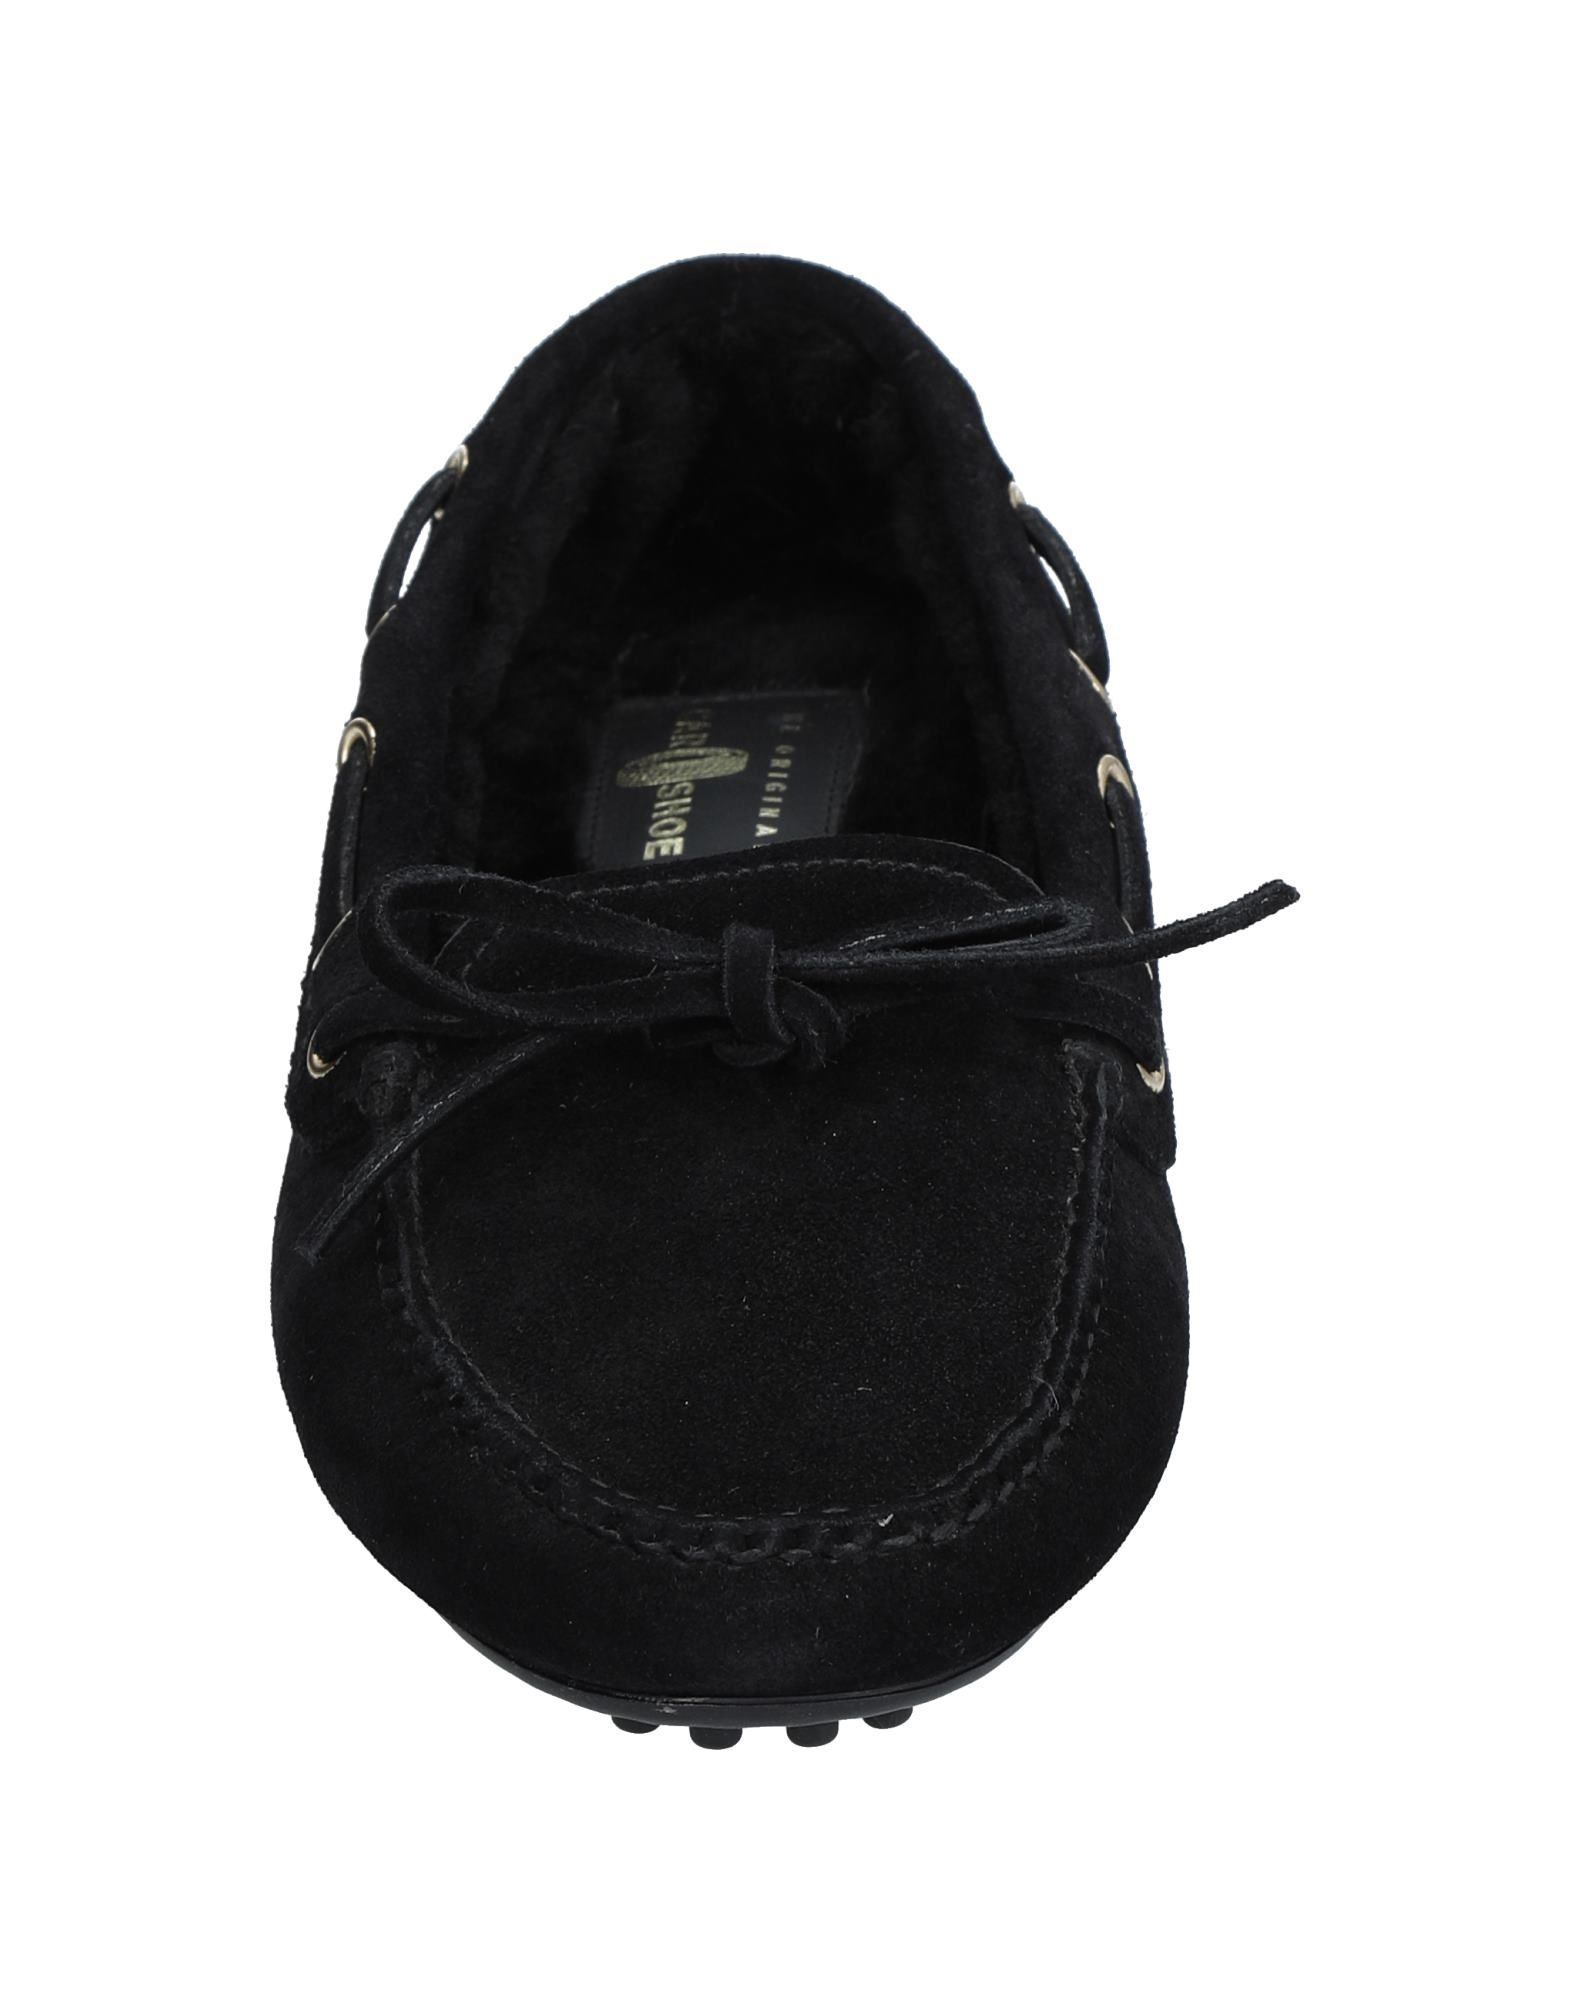 Carshoe Mokassins strapazierfähige Damen  11542847RRGut aussehende strapazierfähige Mokassins Schuhe b4acb3